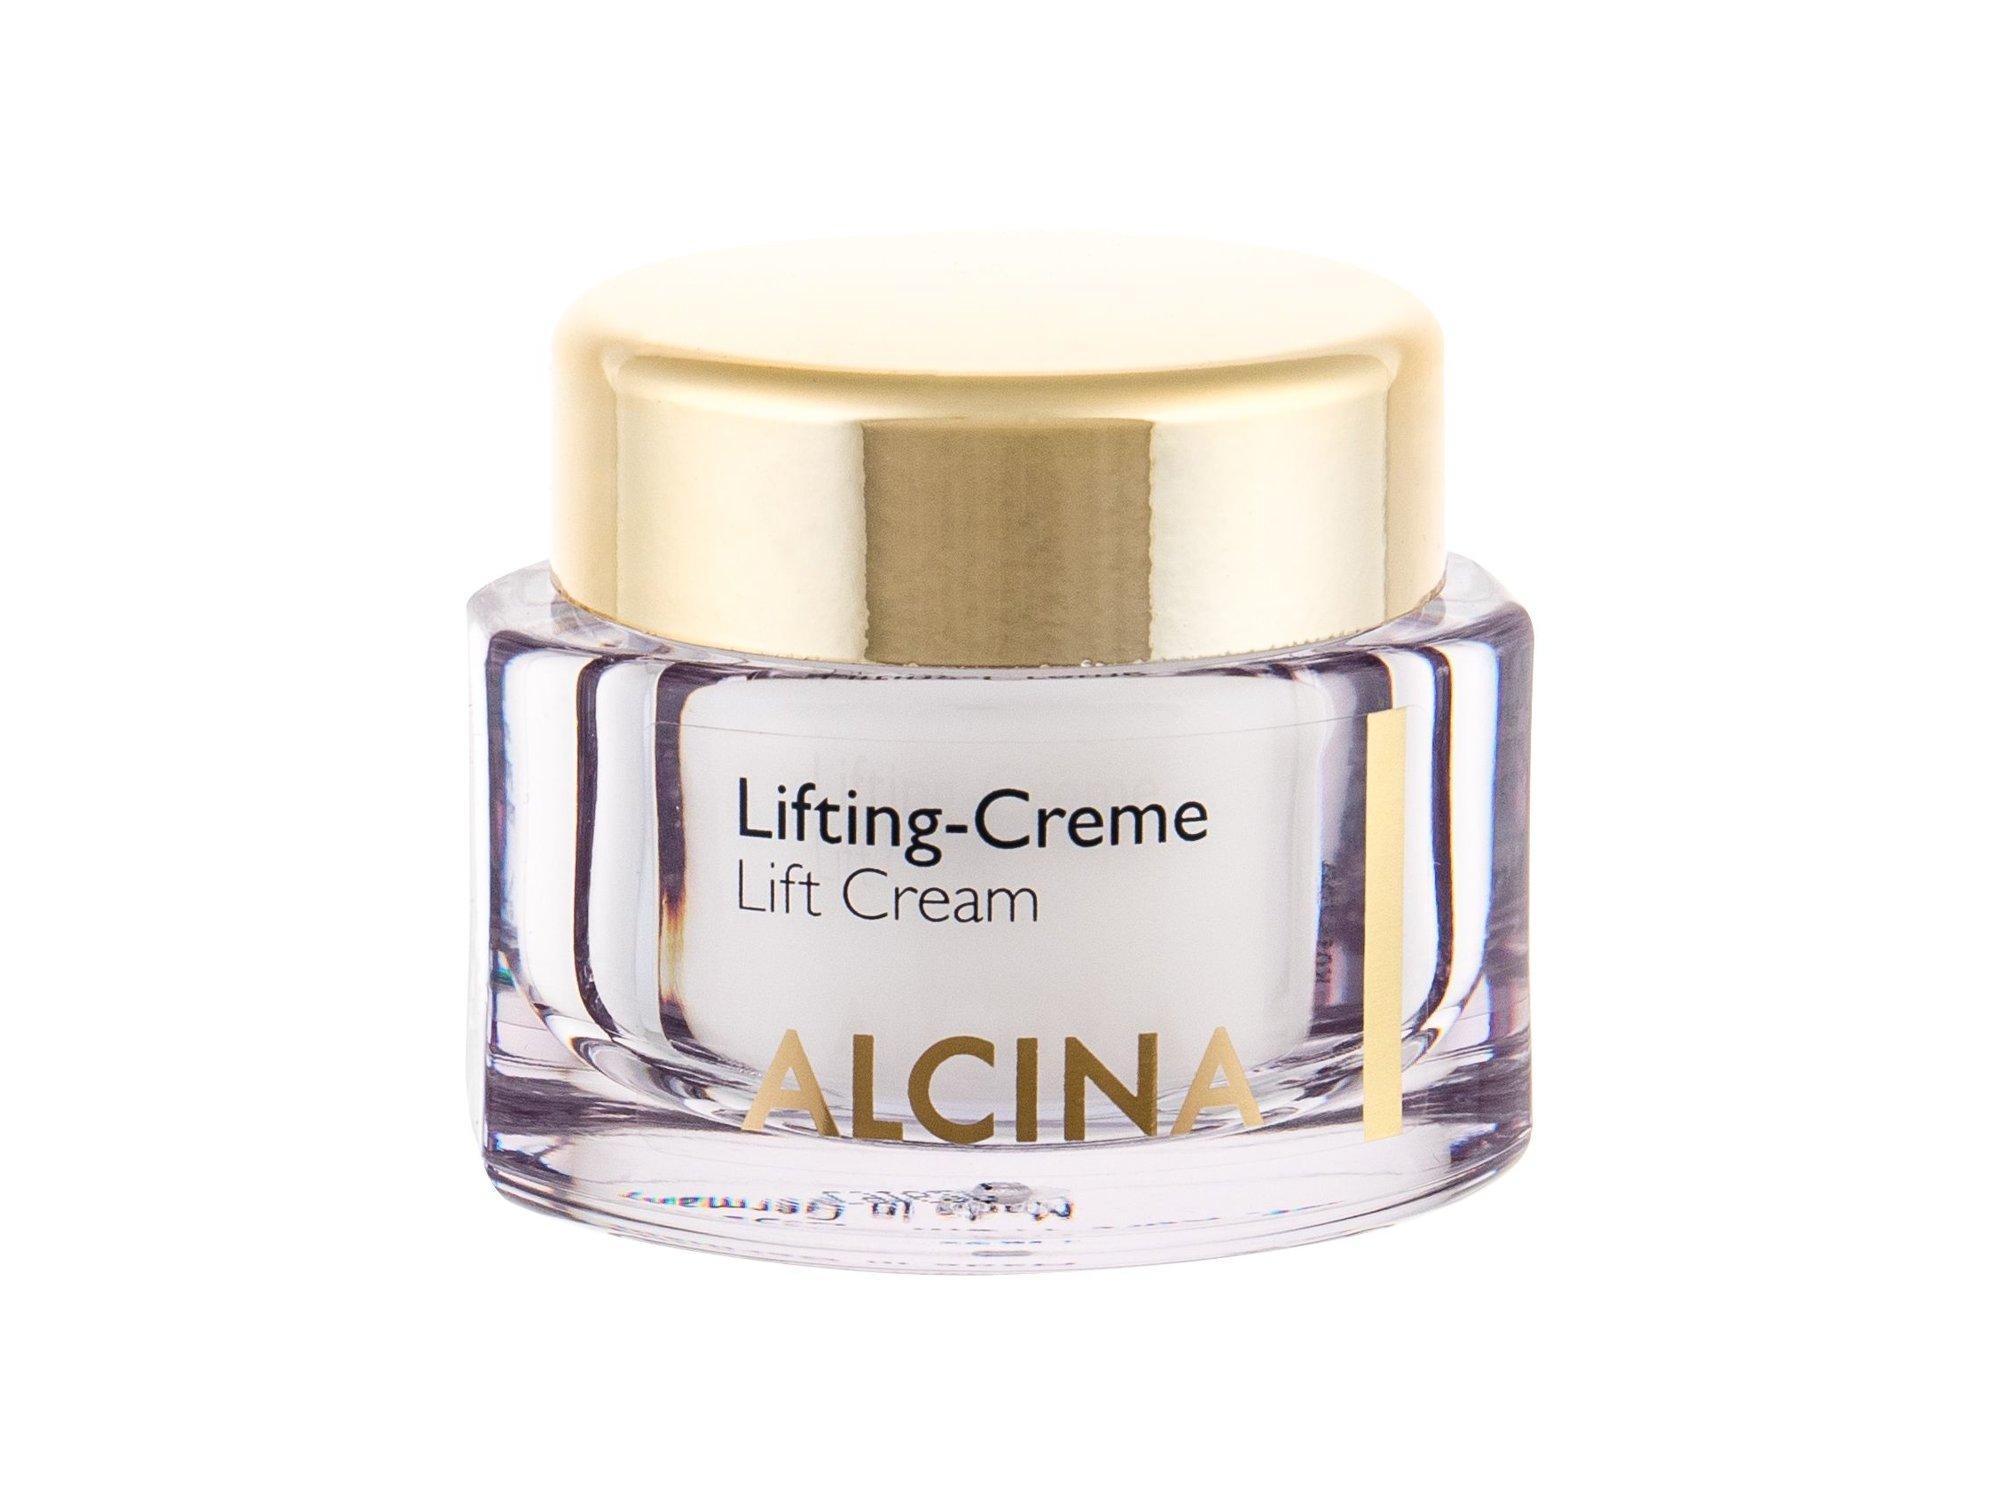 ALCINA Lift Day Cream 50ml